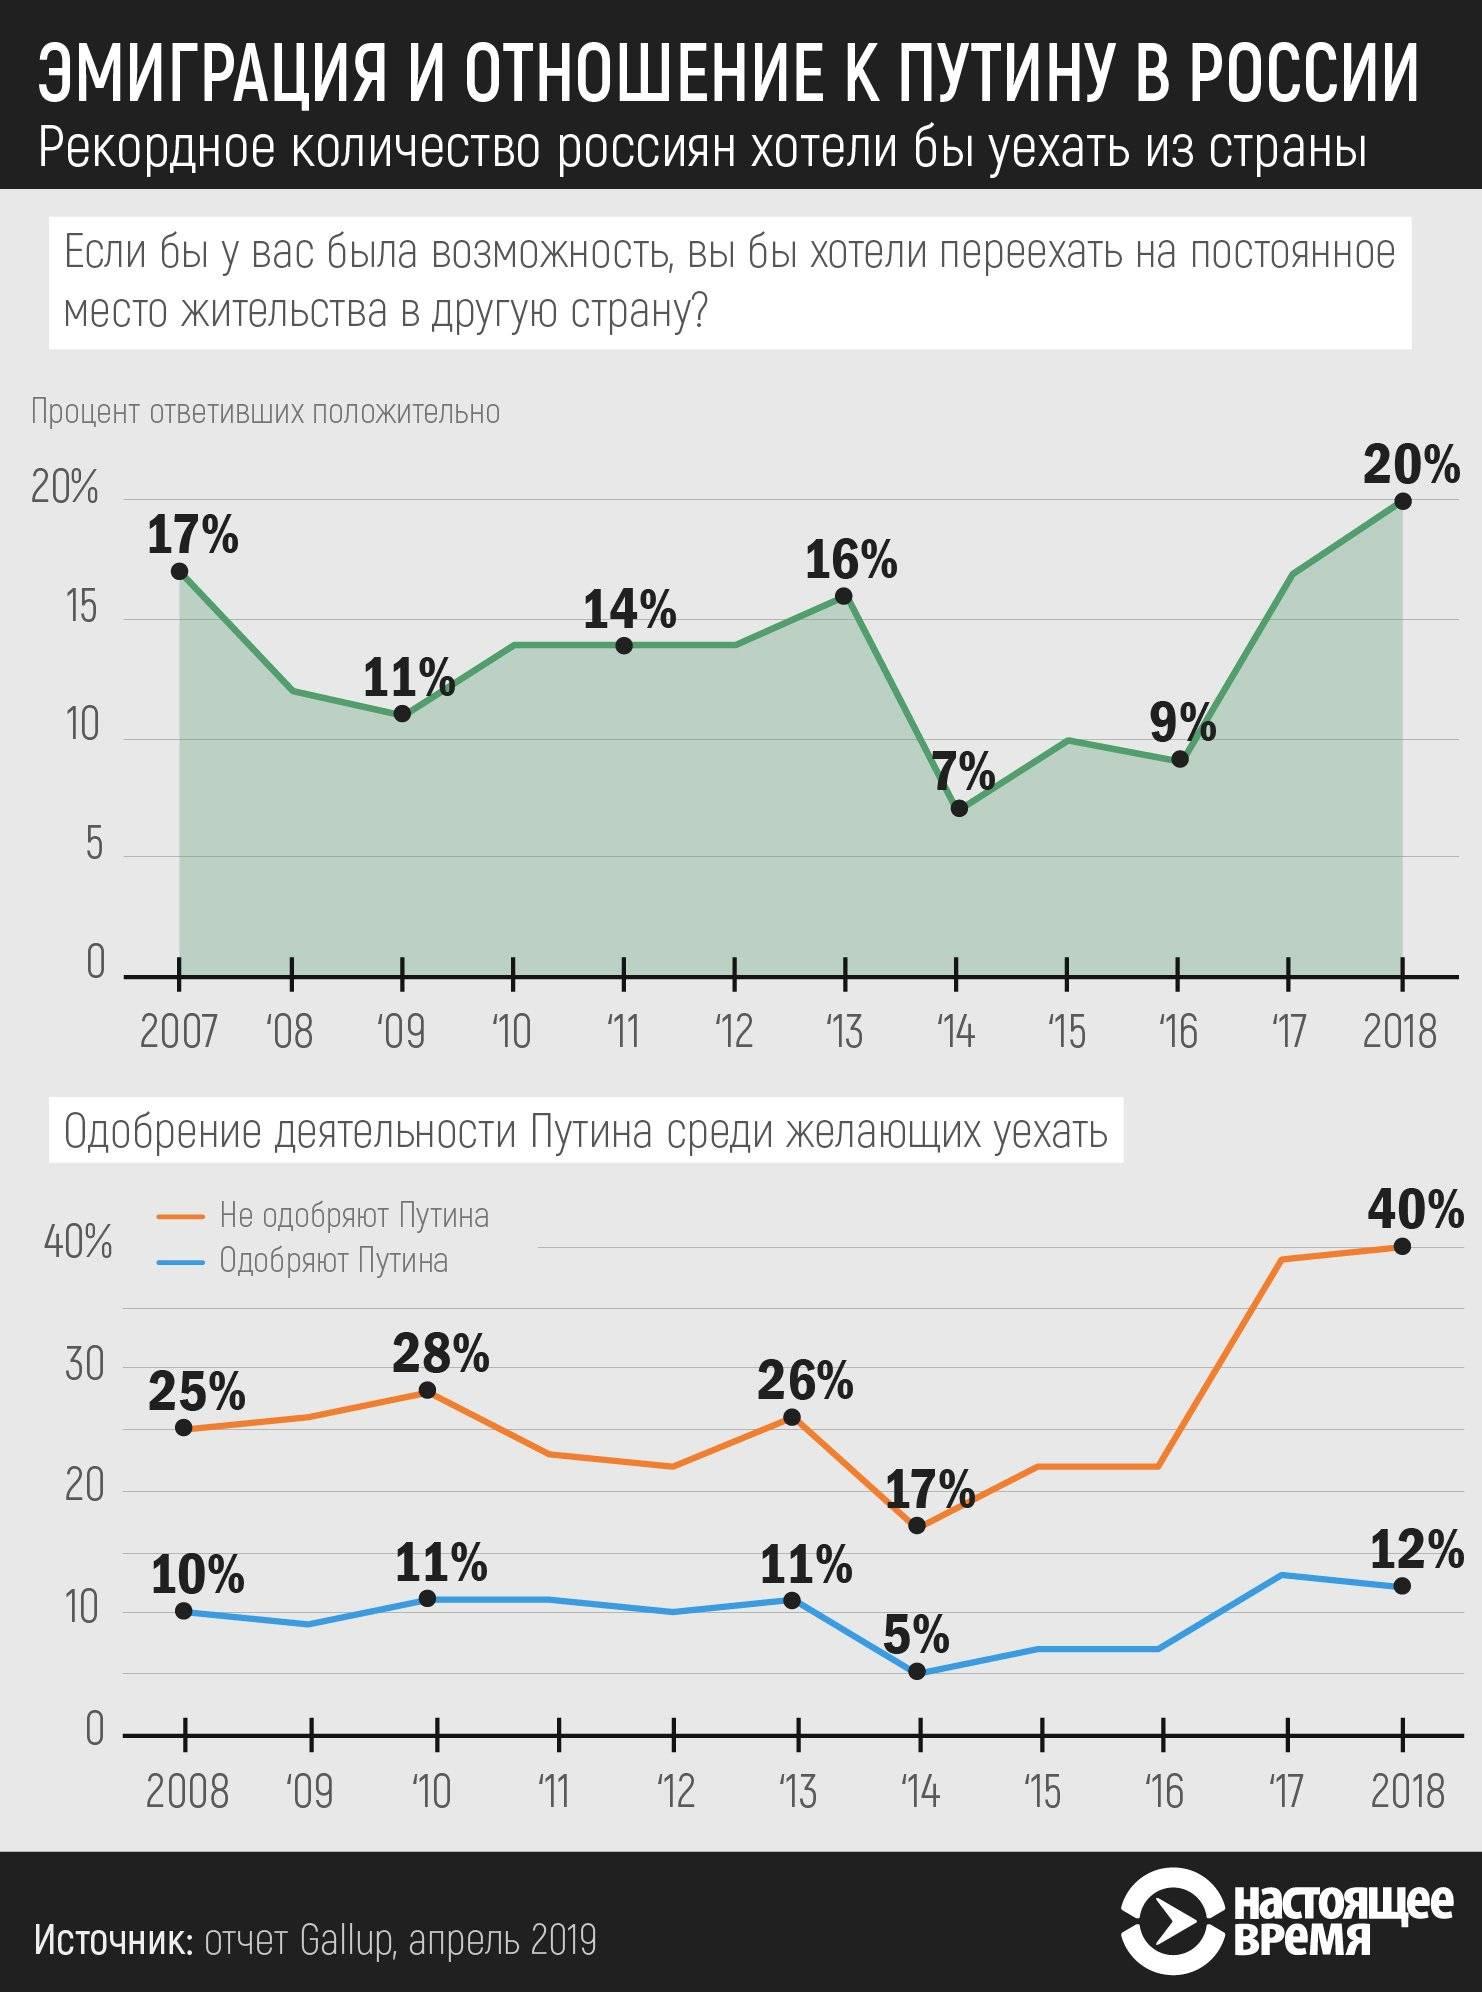 Статистика эмиграции из россии